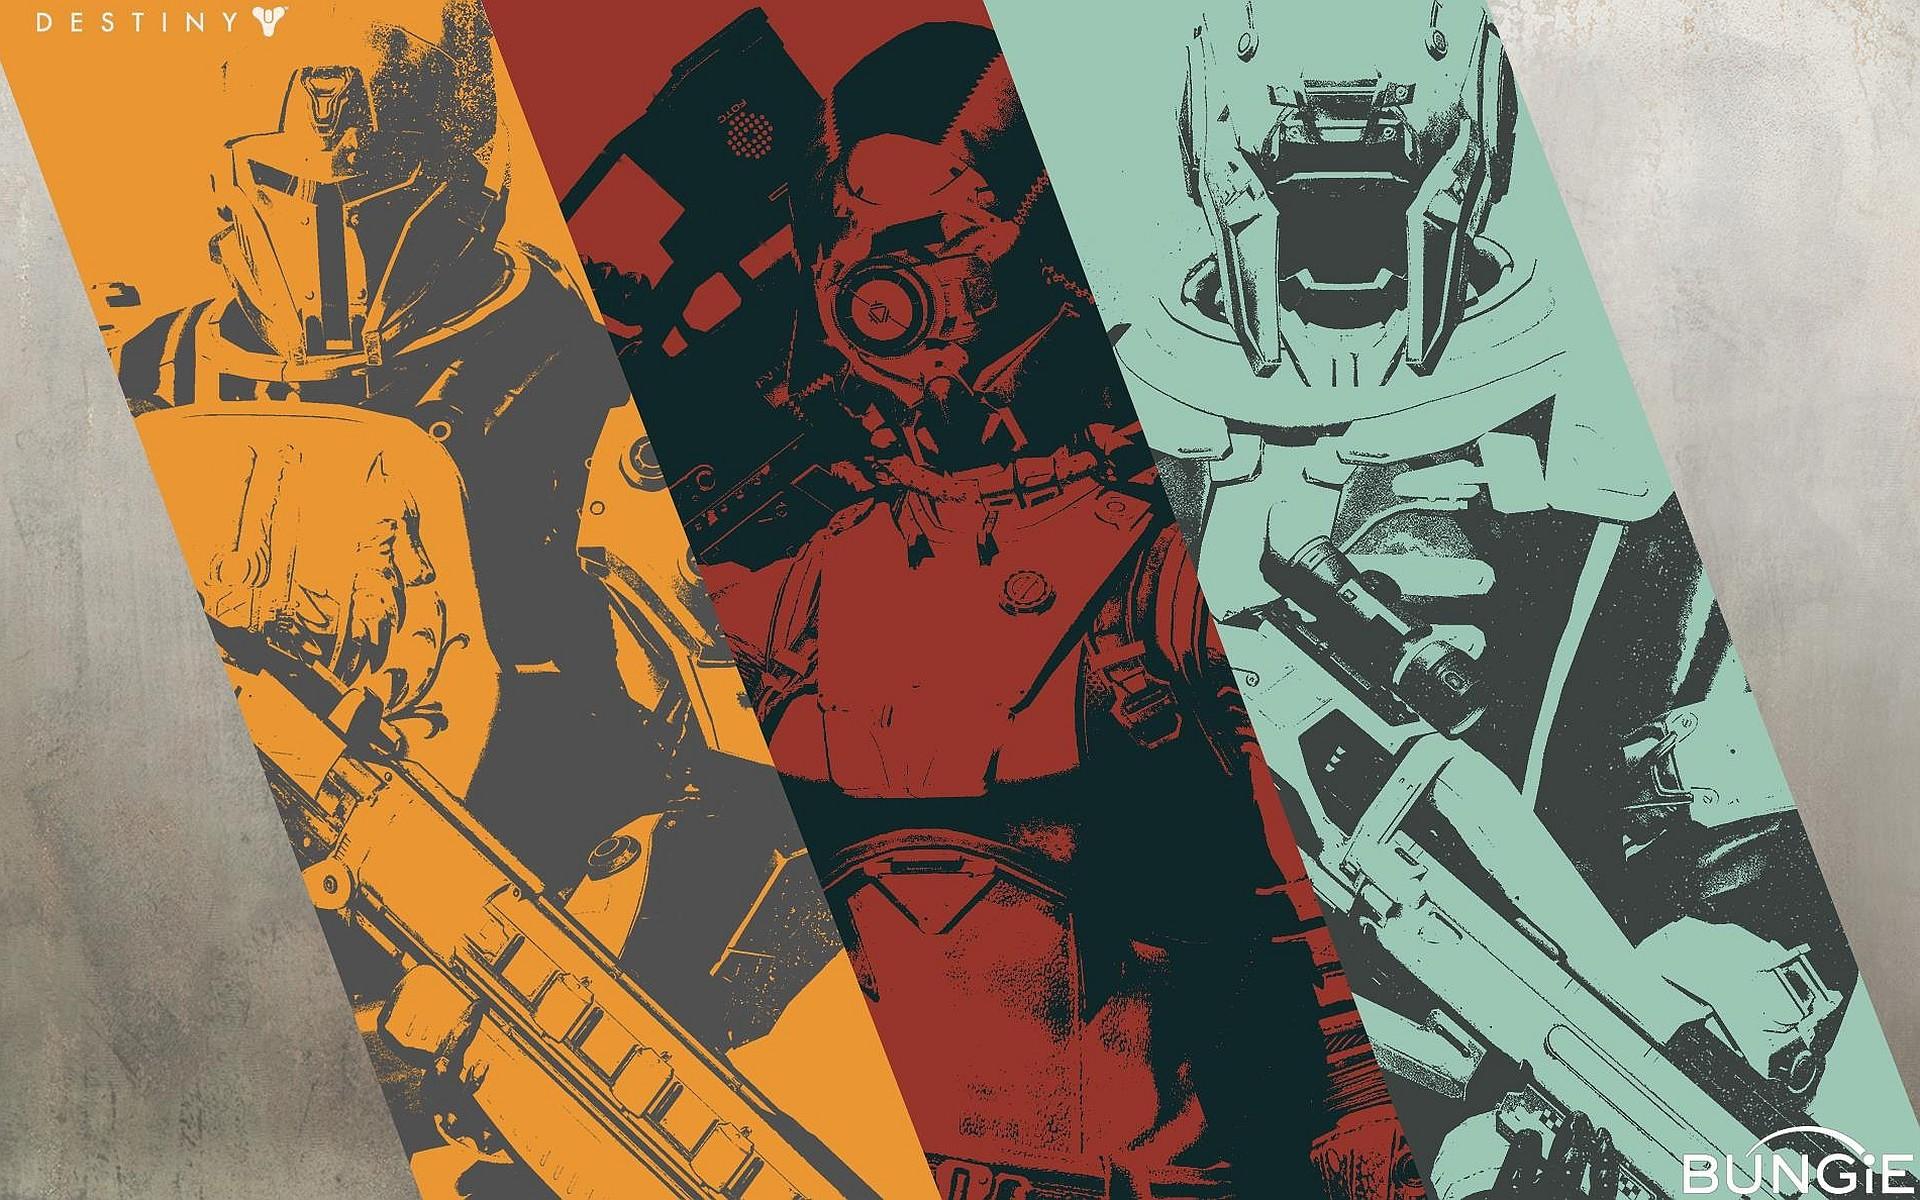 Video Game – Destiny Wallpaper